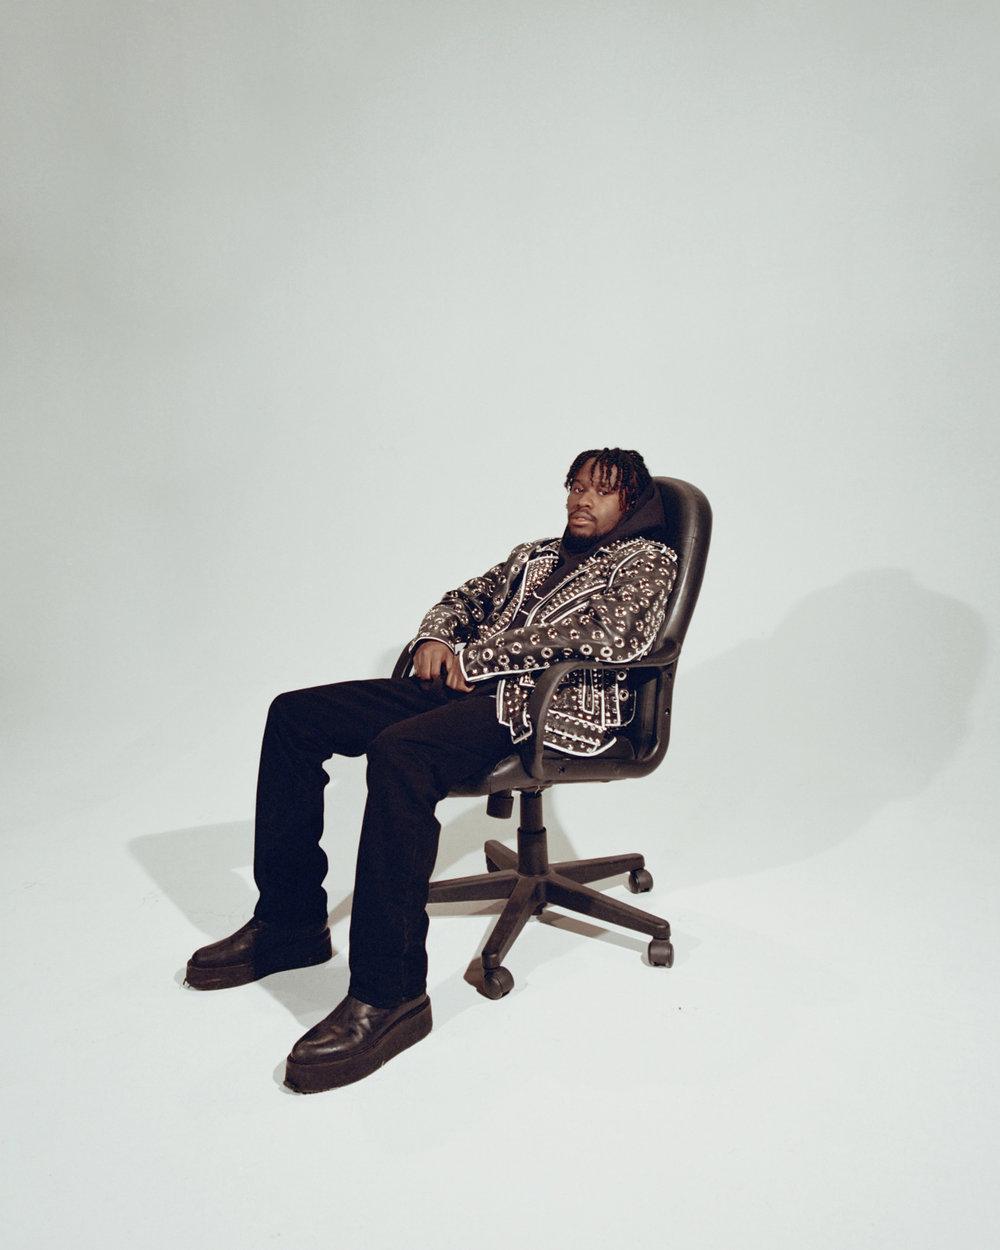 Shameik wears Jacket by La Roxx, Sweatshirt by Karl Kani.